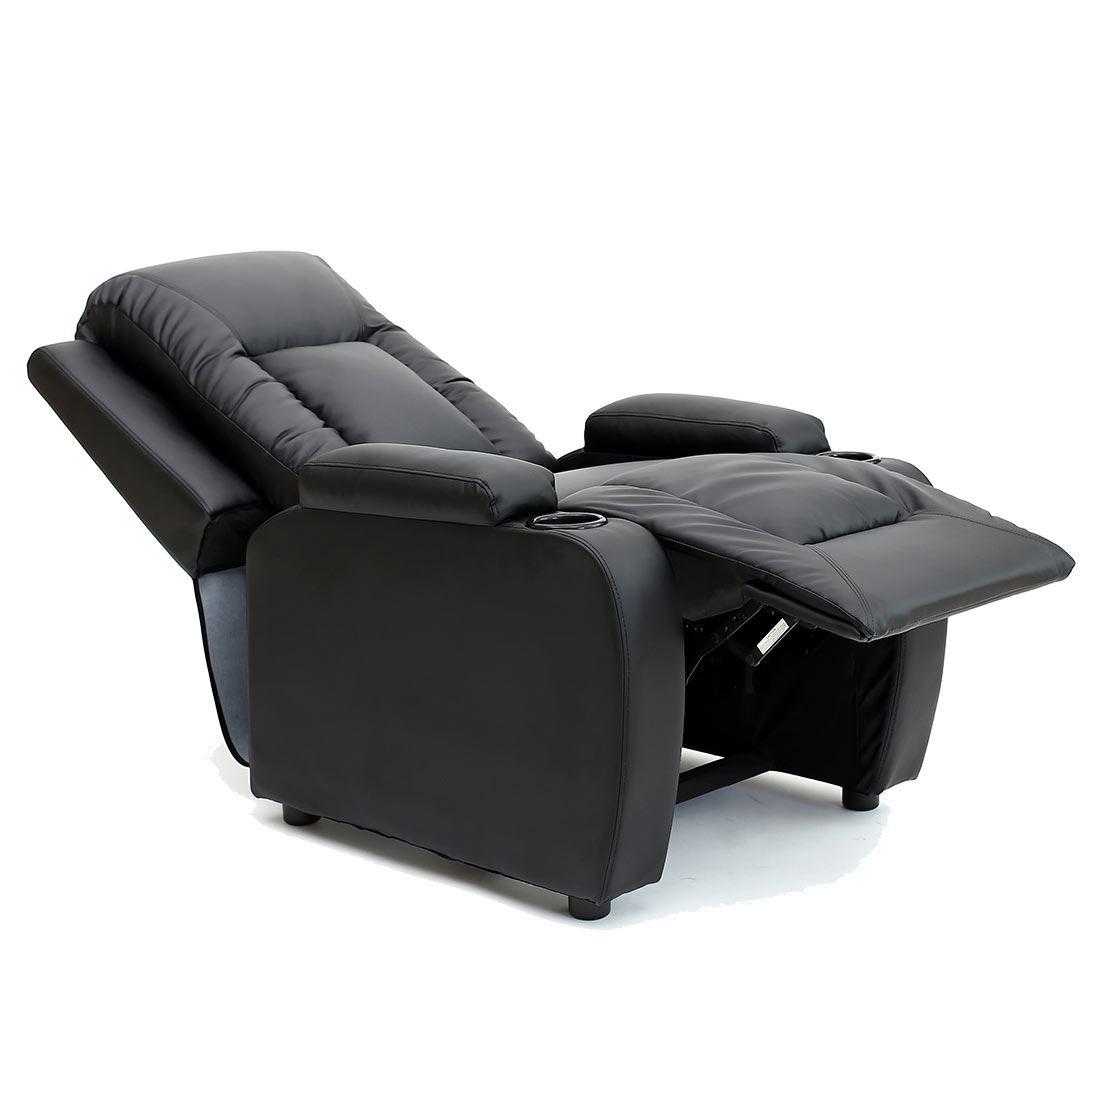 sofa armchair drink holder caddy cheap teal set oscar leather recliner w holders chair